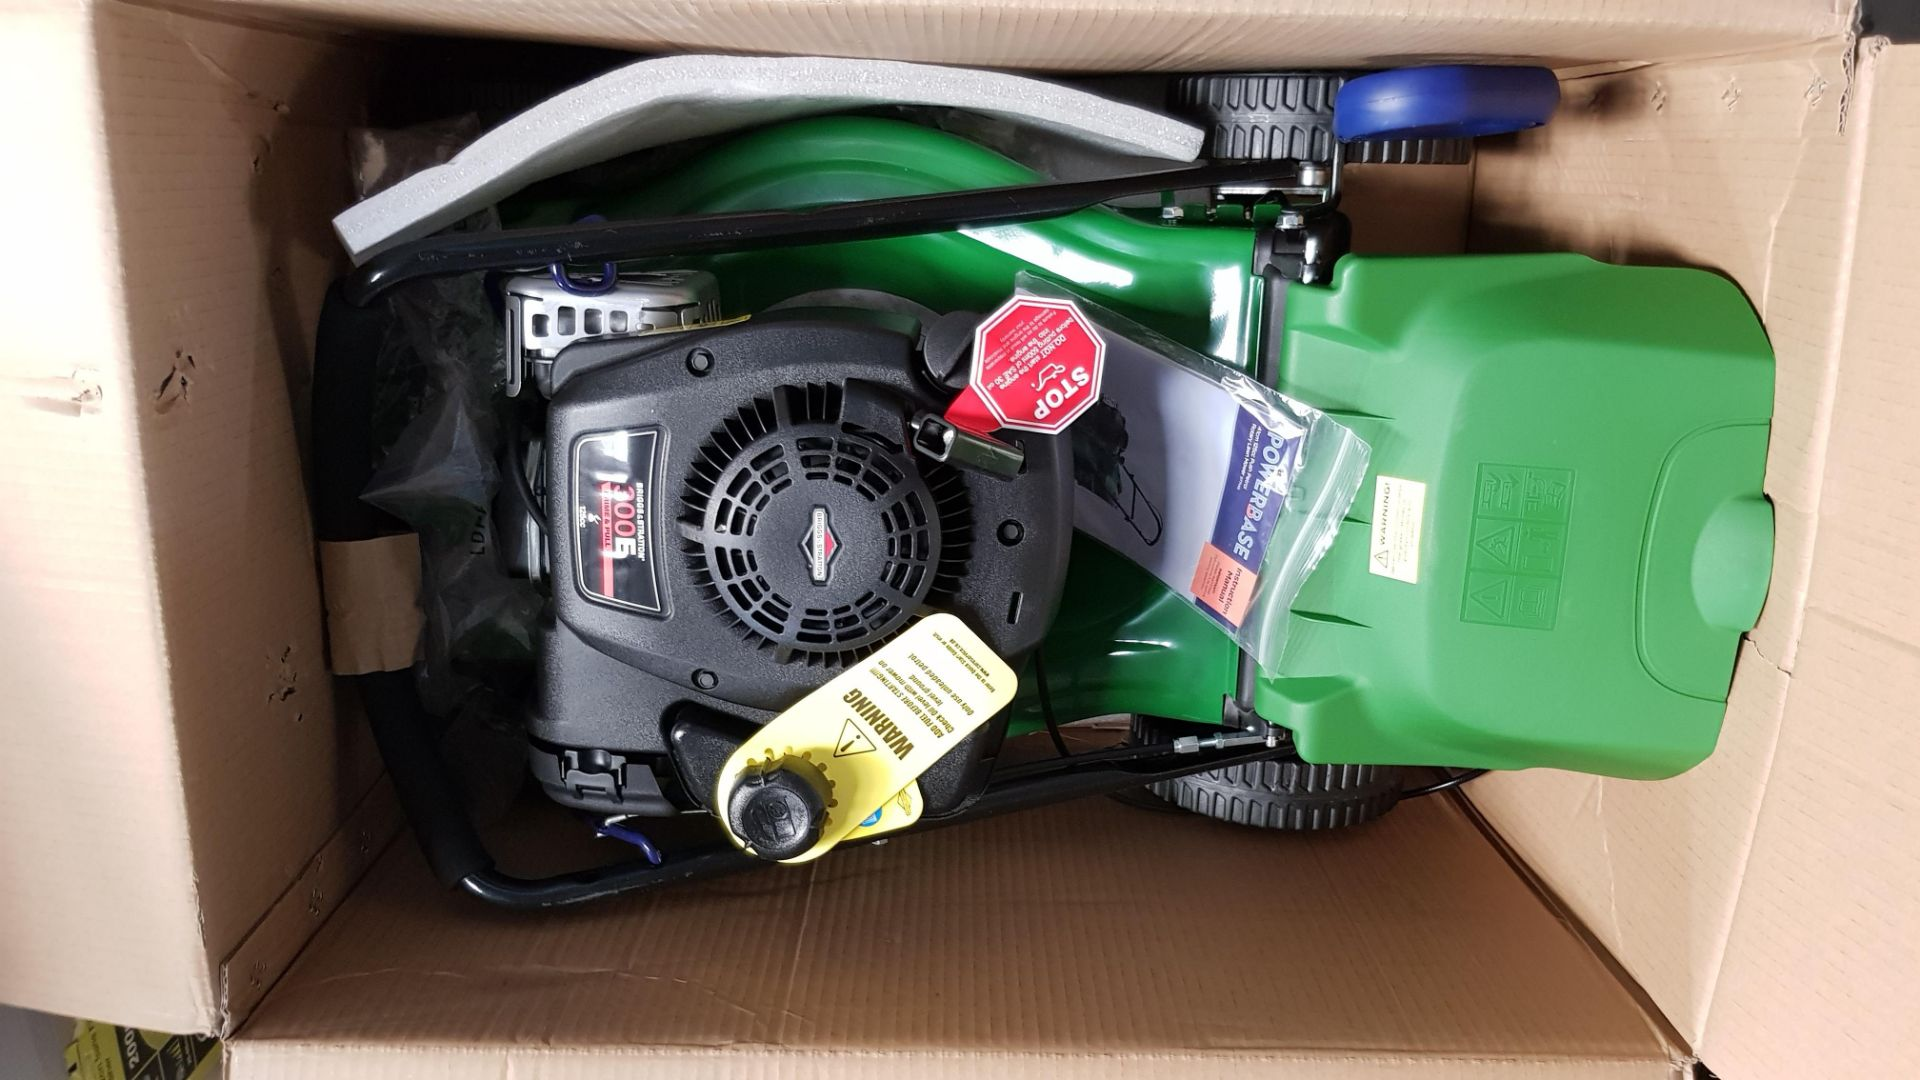 (P5) 1x Powerbase 41cm 125cc Pish Petrol Rotary Lawn Mower. RRP £199.00. Unit Is Clean, Appears N - Image 5 of 5